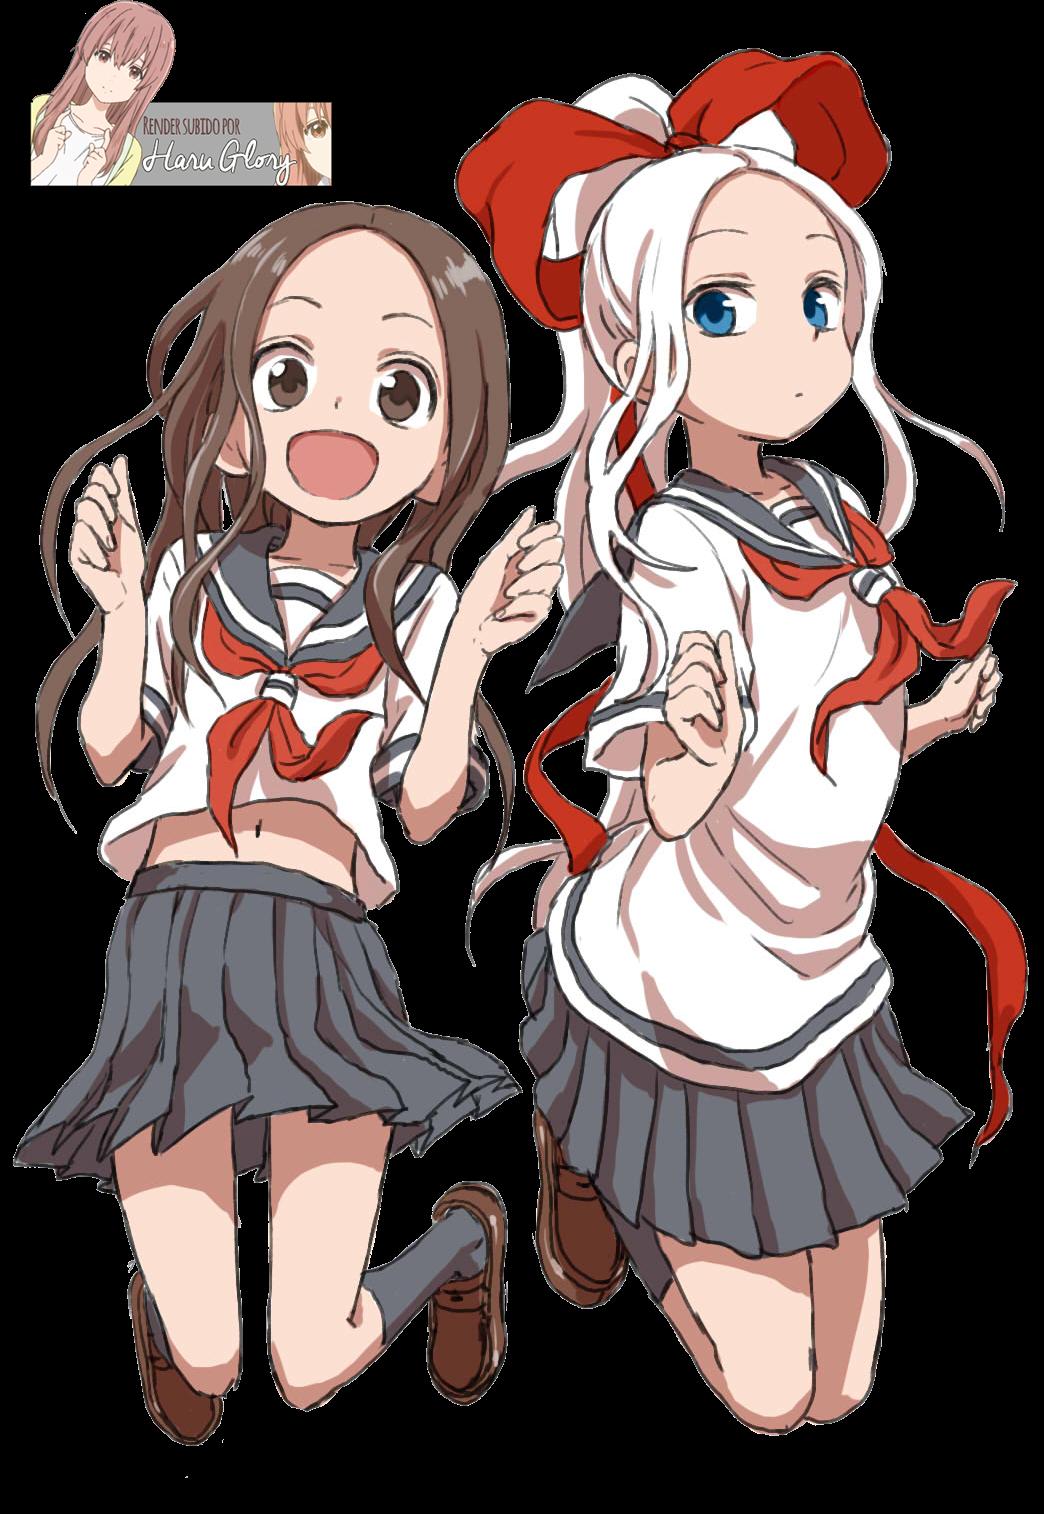 Takagi y fudatsuki kyouko